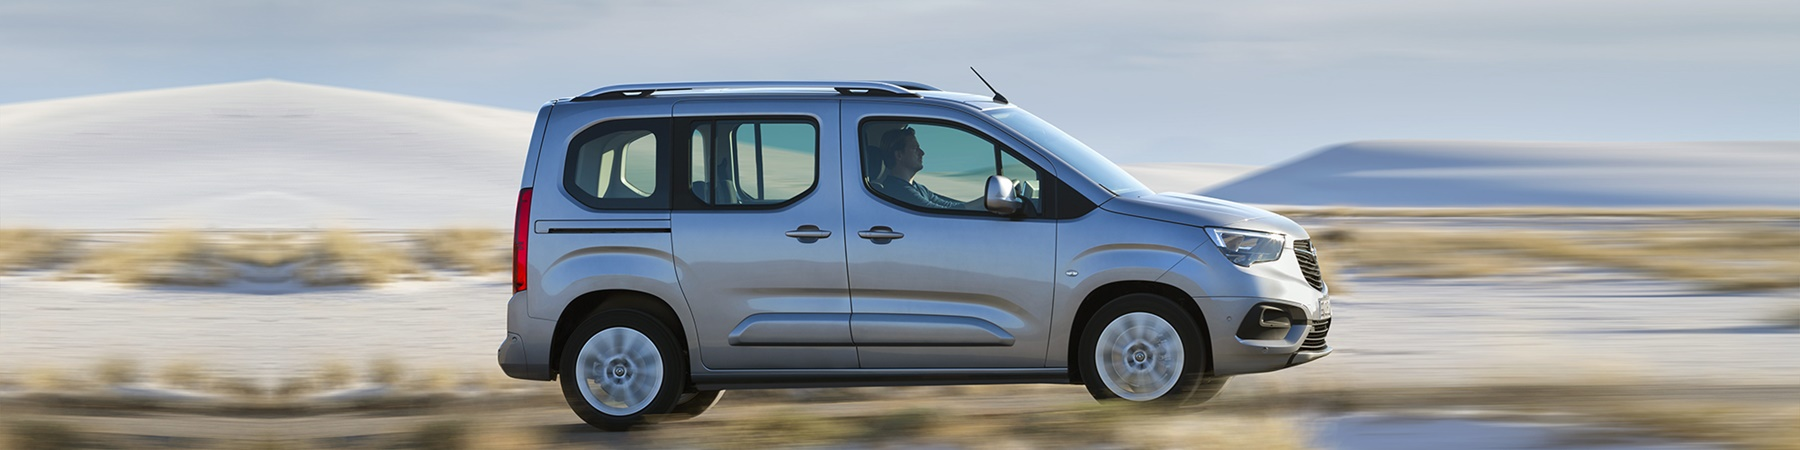 Opel Combo Life 50kWh 238 km actieradius